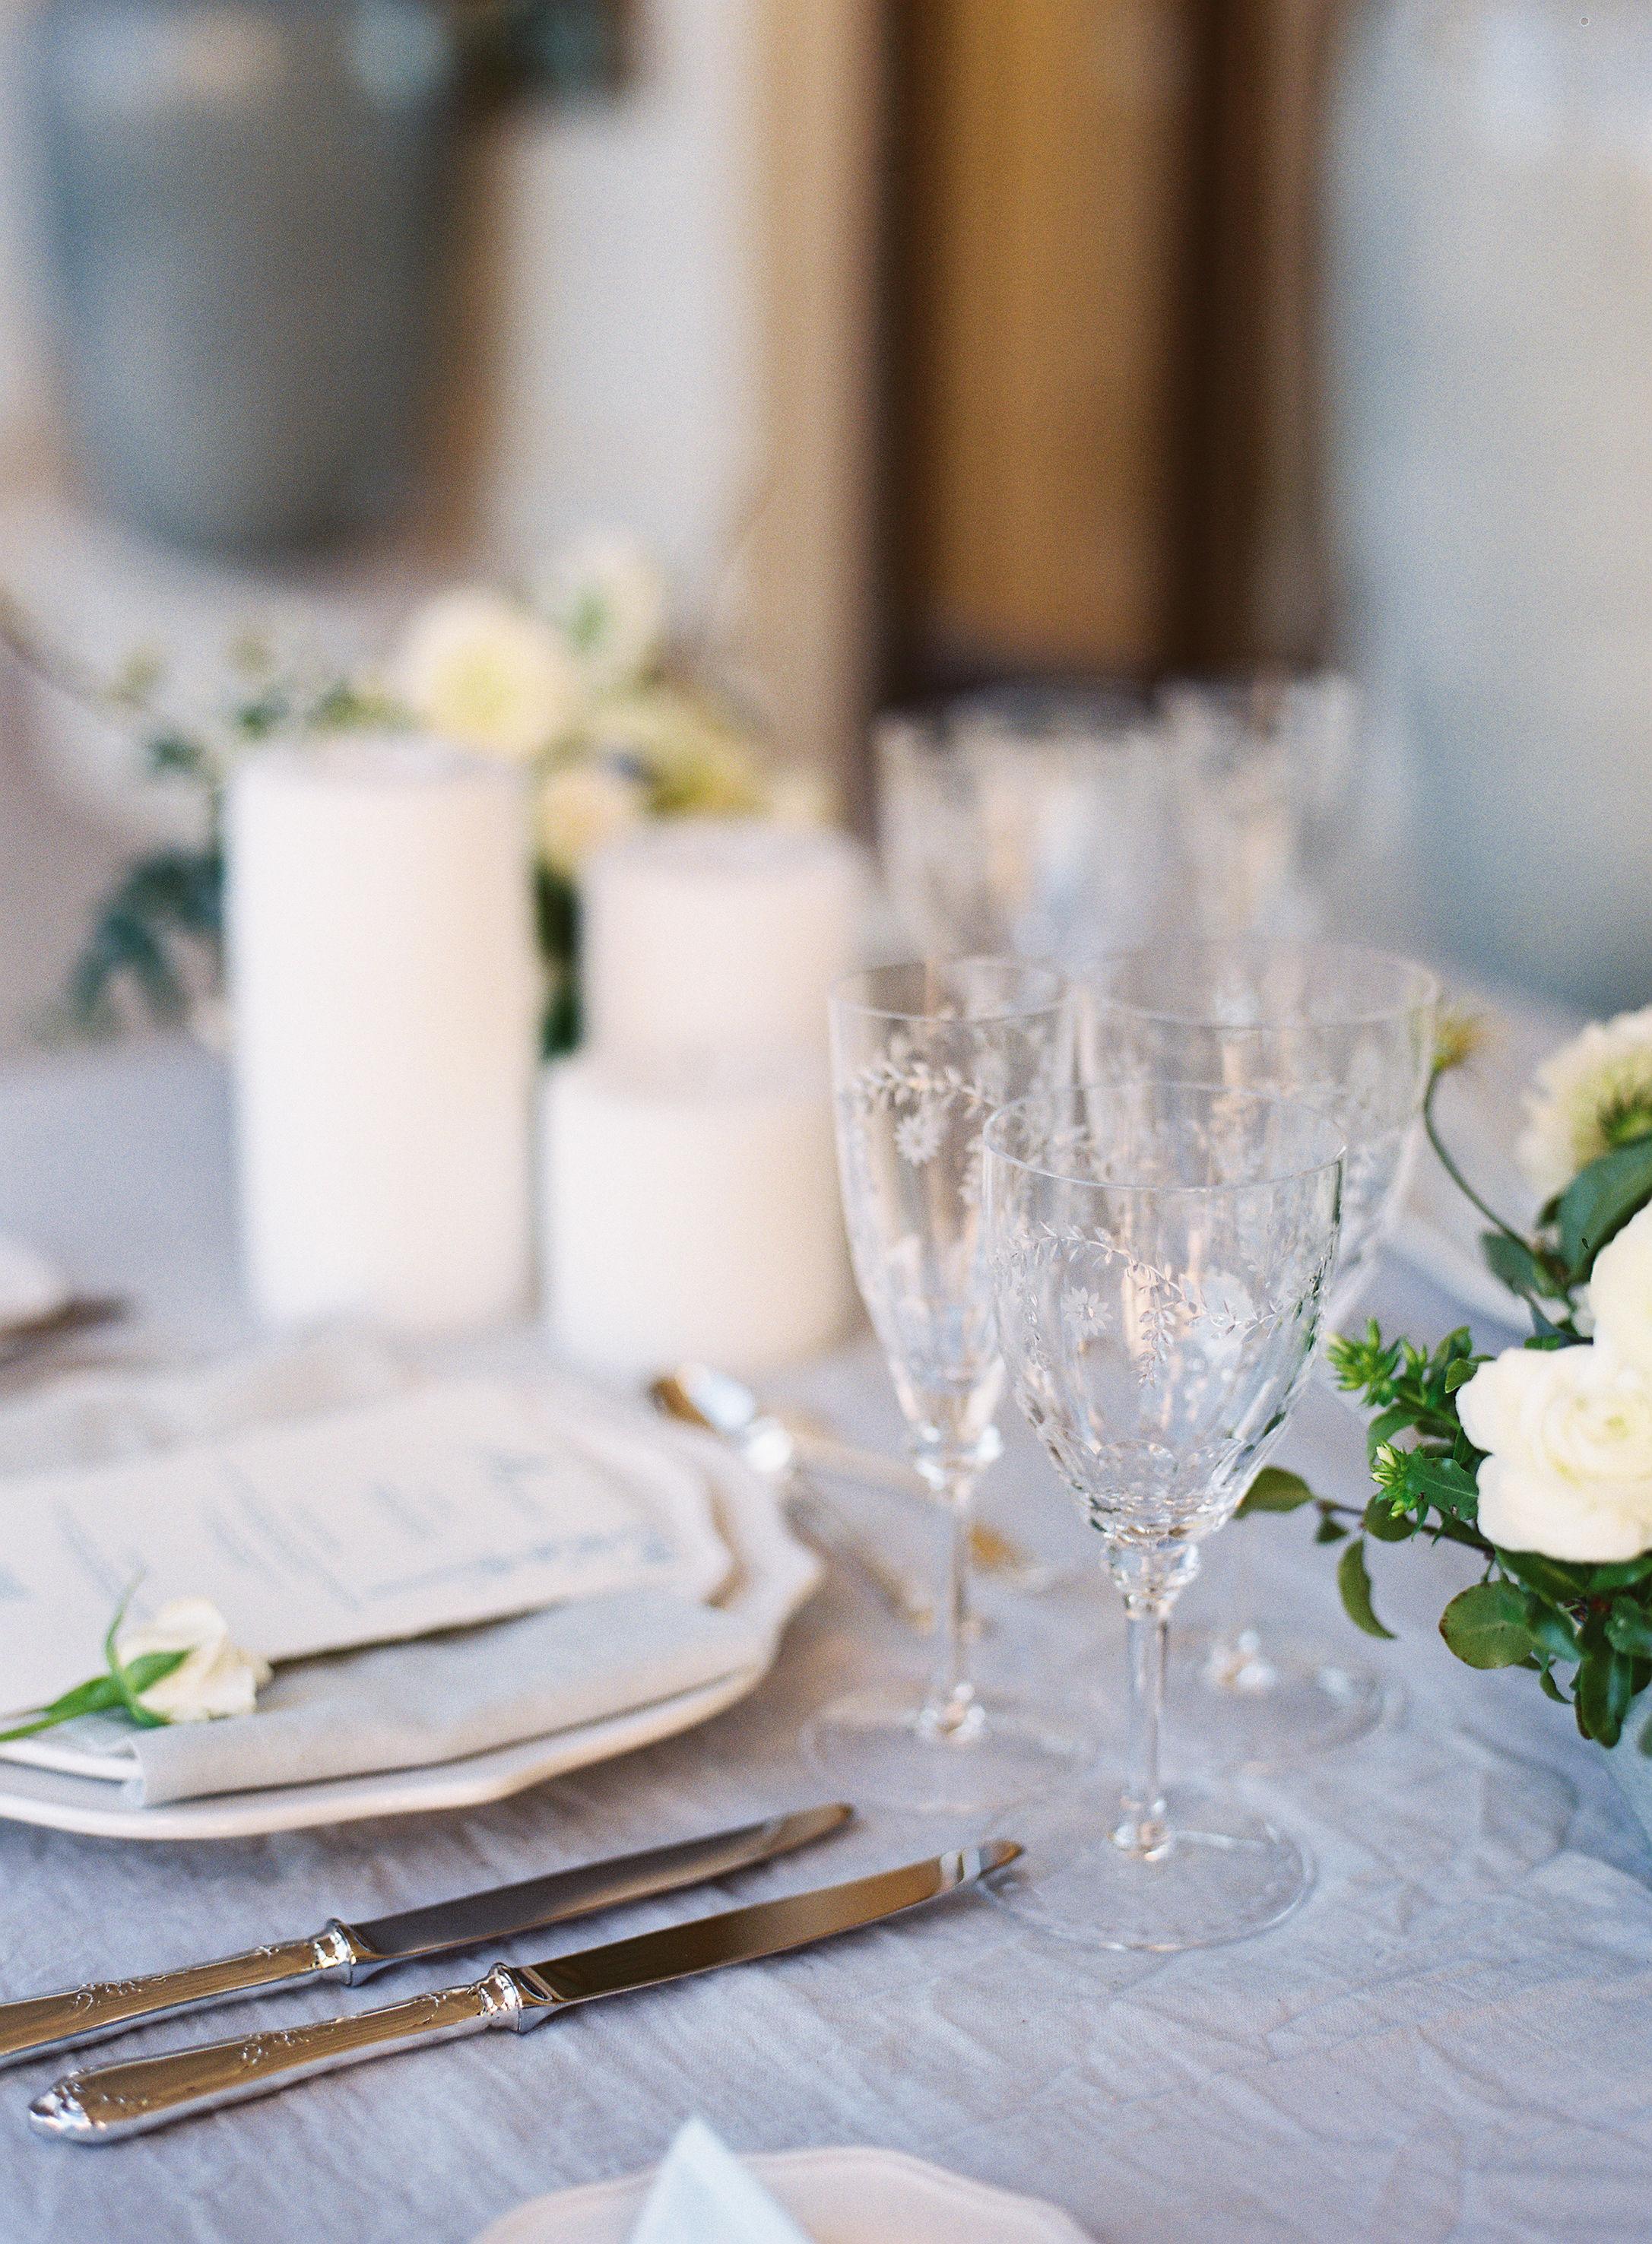 The Timeless Stylist-A Forgotten Love Story-Fine Art Wedding Editorial-Heirloom Wedding Styling 51.jpg